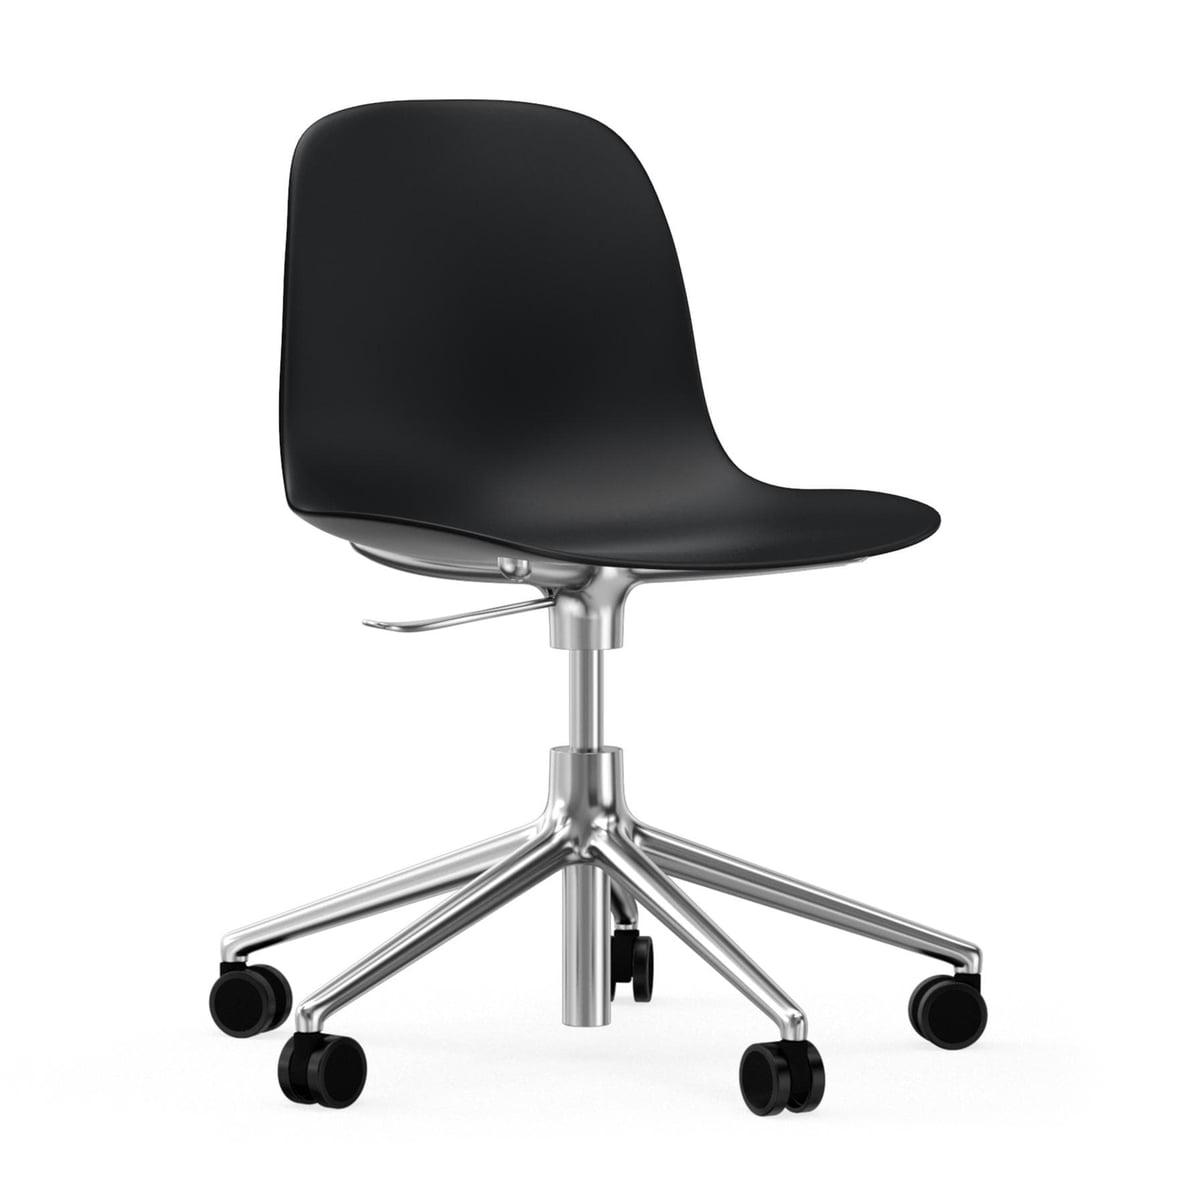 Form Swivel Office Chair by Normann Copenhagen in Black / Aluminium  sc 1 st  Connox & Buy the Form Swivel Office Chair by Normann Copenhagen | Connox